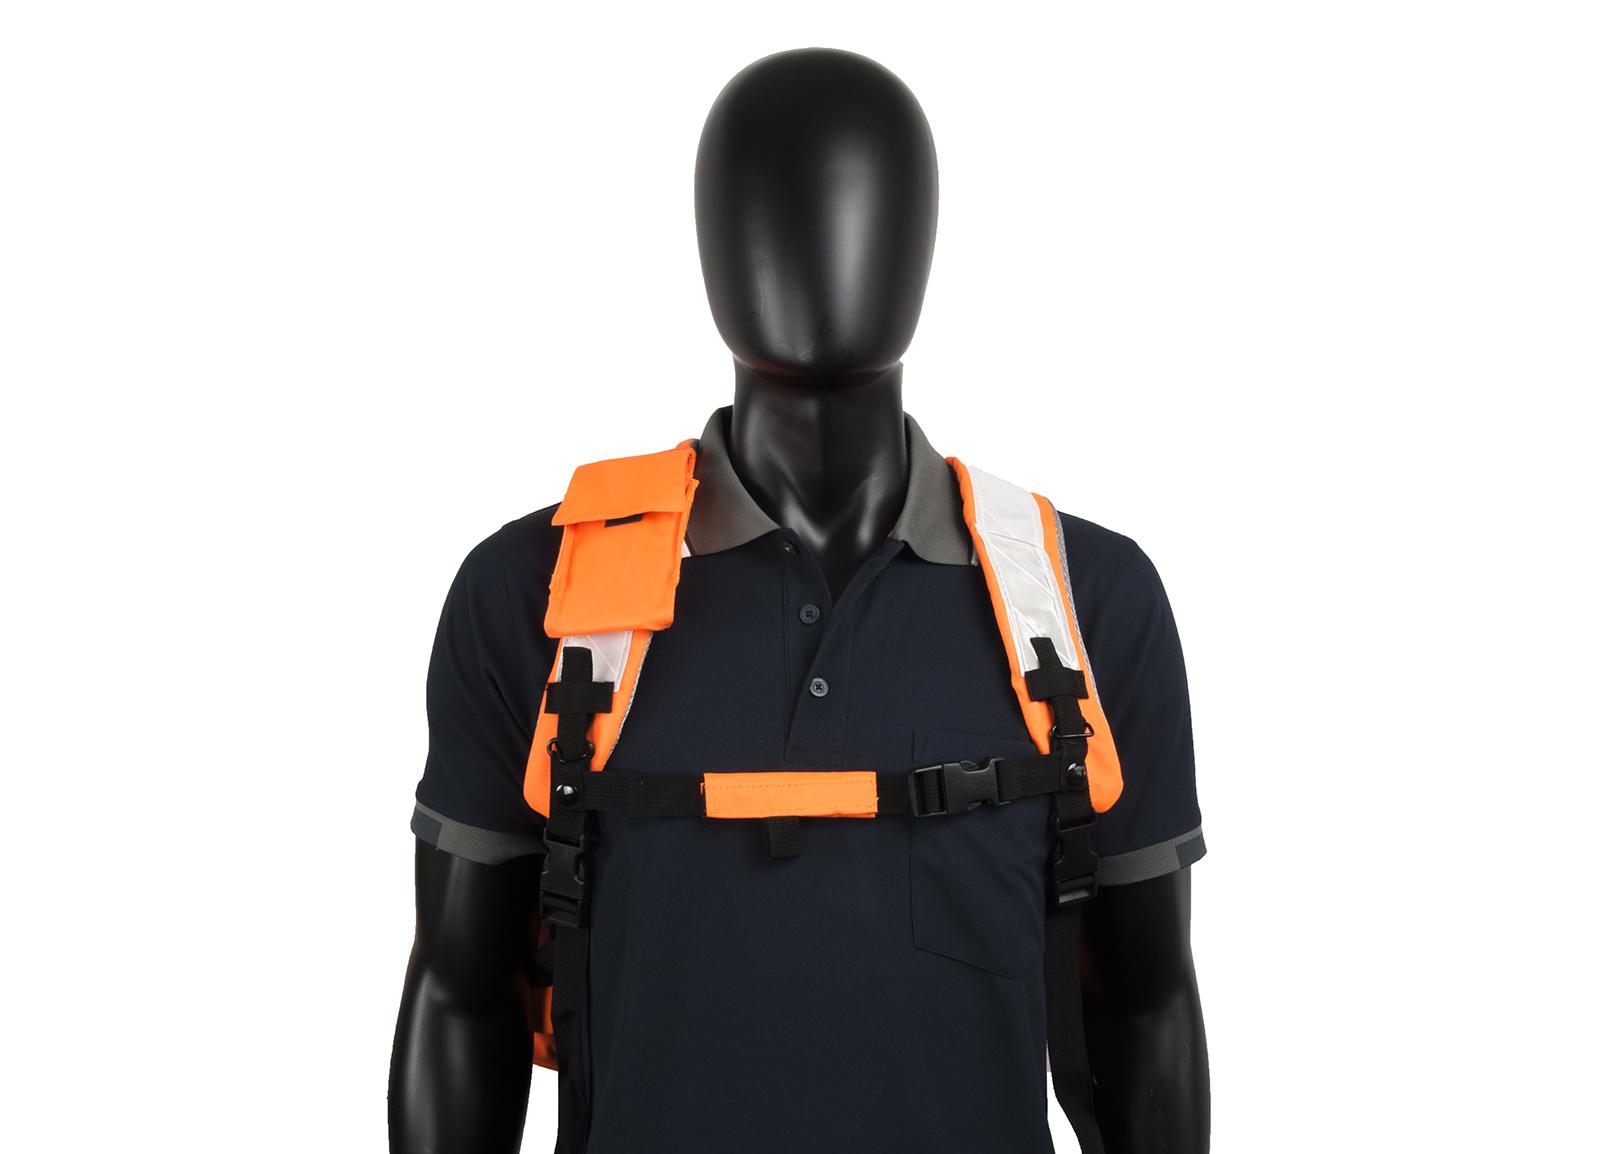 High Vis Backpack Work Rucksack w/ Anti-Entanglement System & Reflective Stripes -1